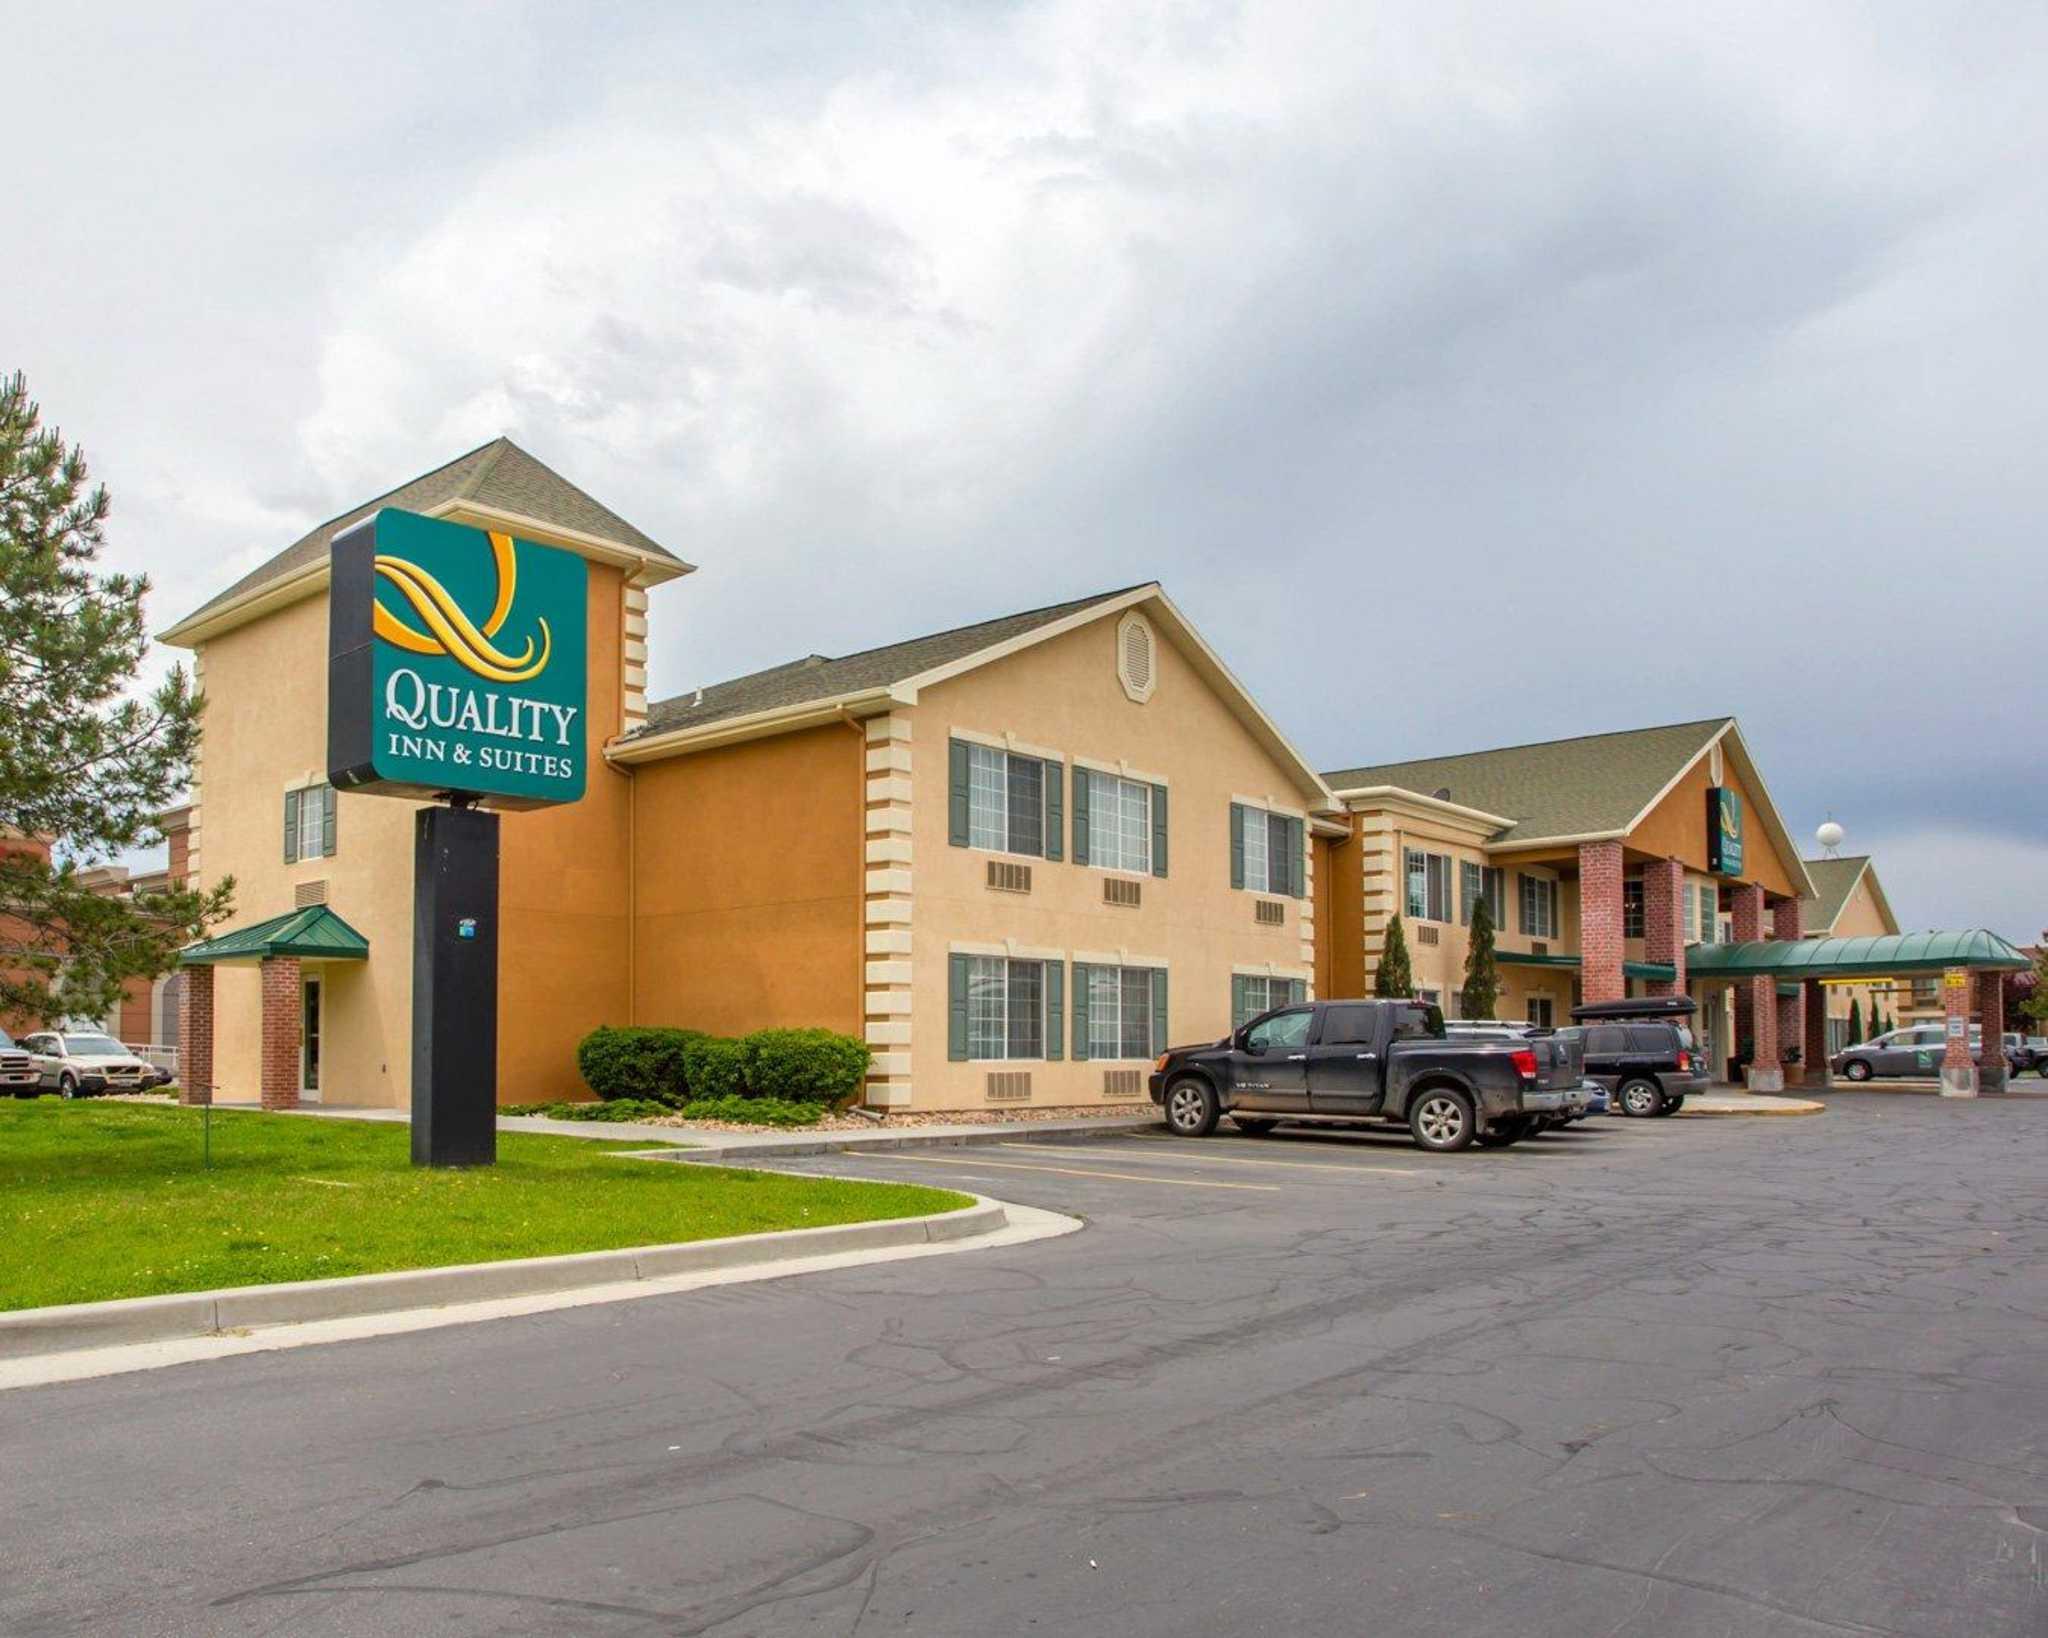 Salt Lake City Motels Near Airport